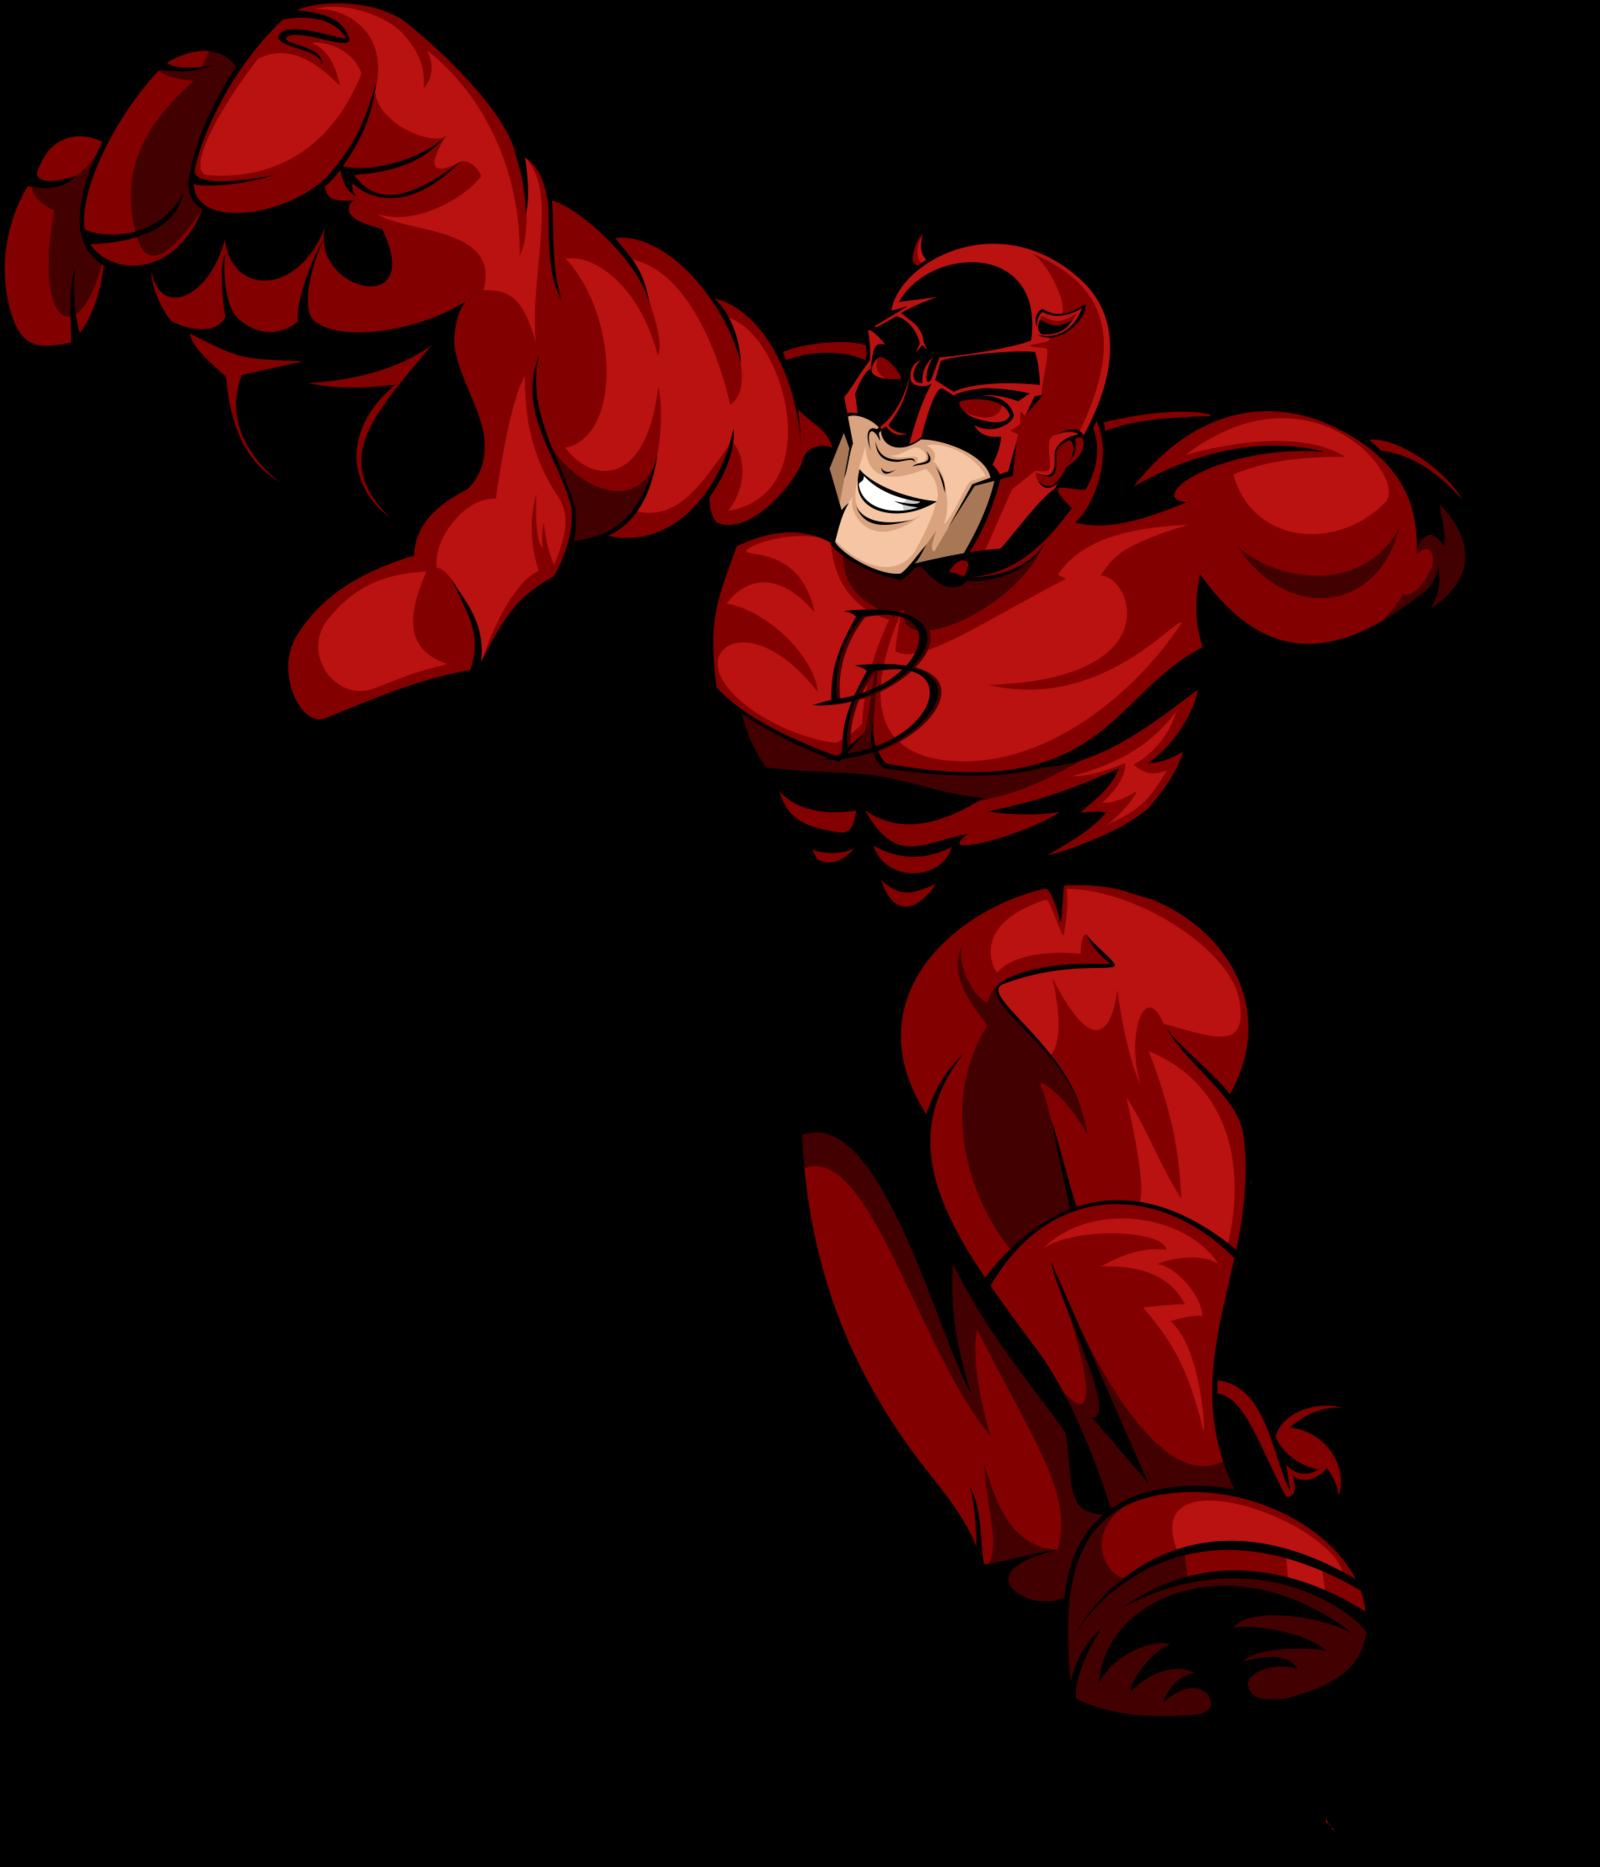 Marvel character clipart on transparent background jpg stock Marvel Daredevil PNG Transparent Images | Free Download Clip Art ... jpg stock